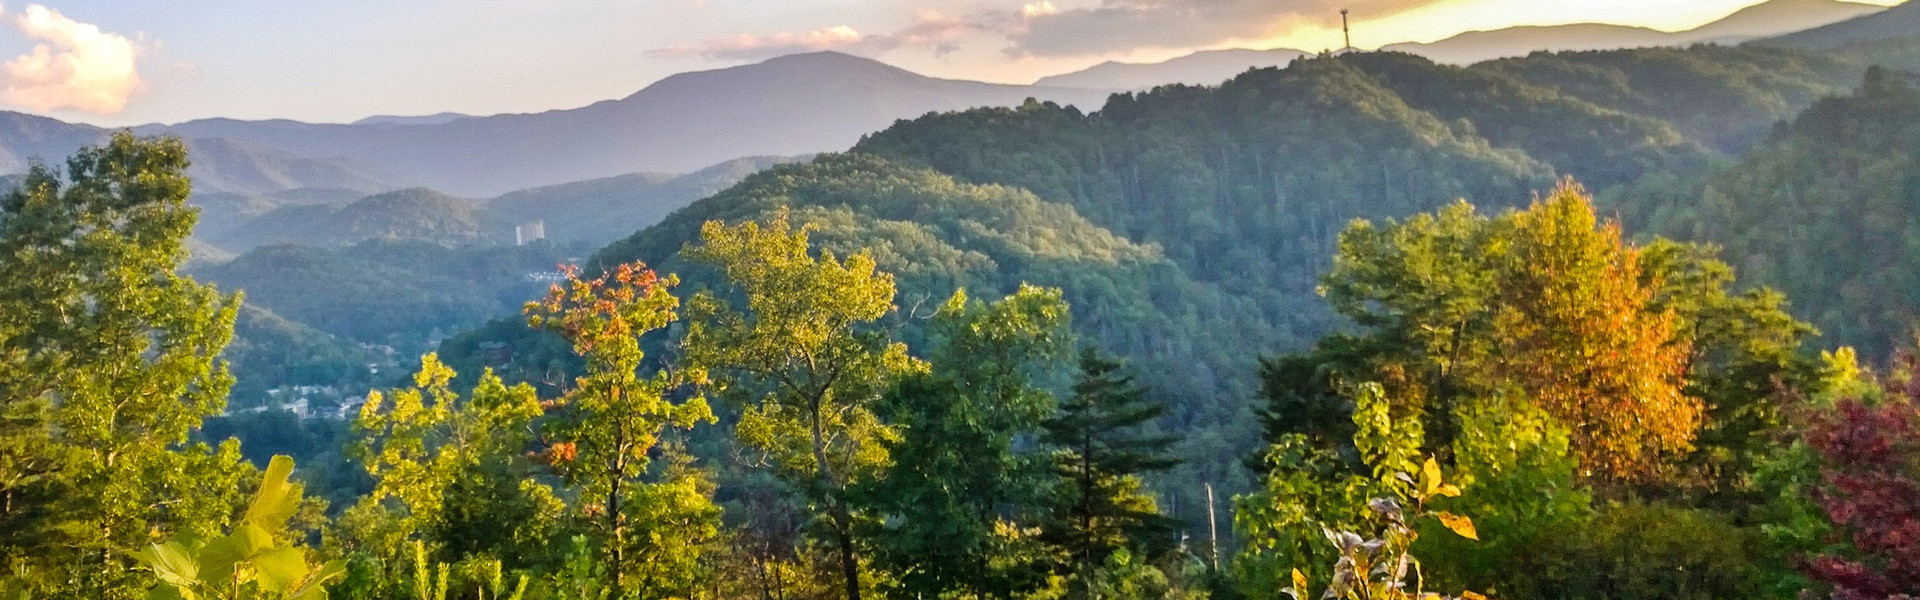 Ziplining in Gatlinburg near the Smoky Mountains | Mountain Ziplining